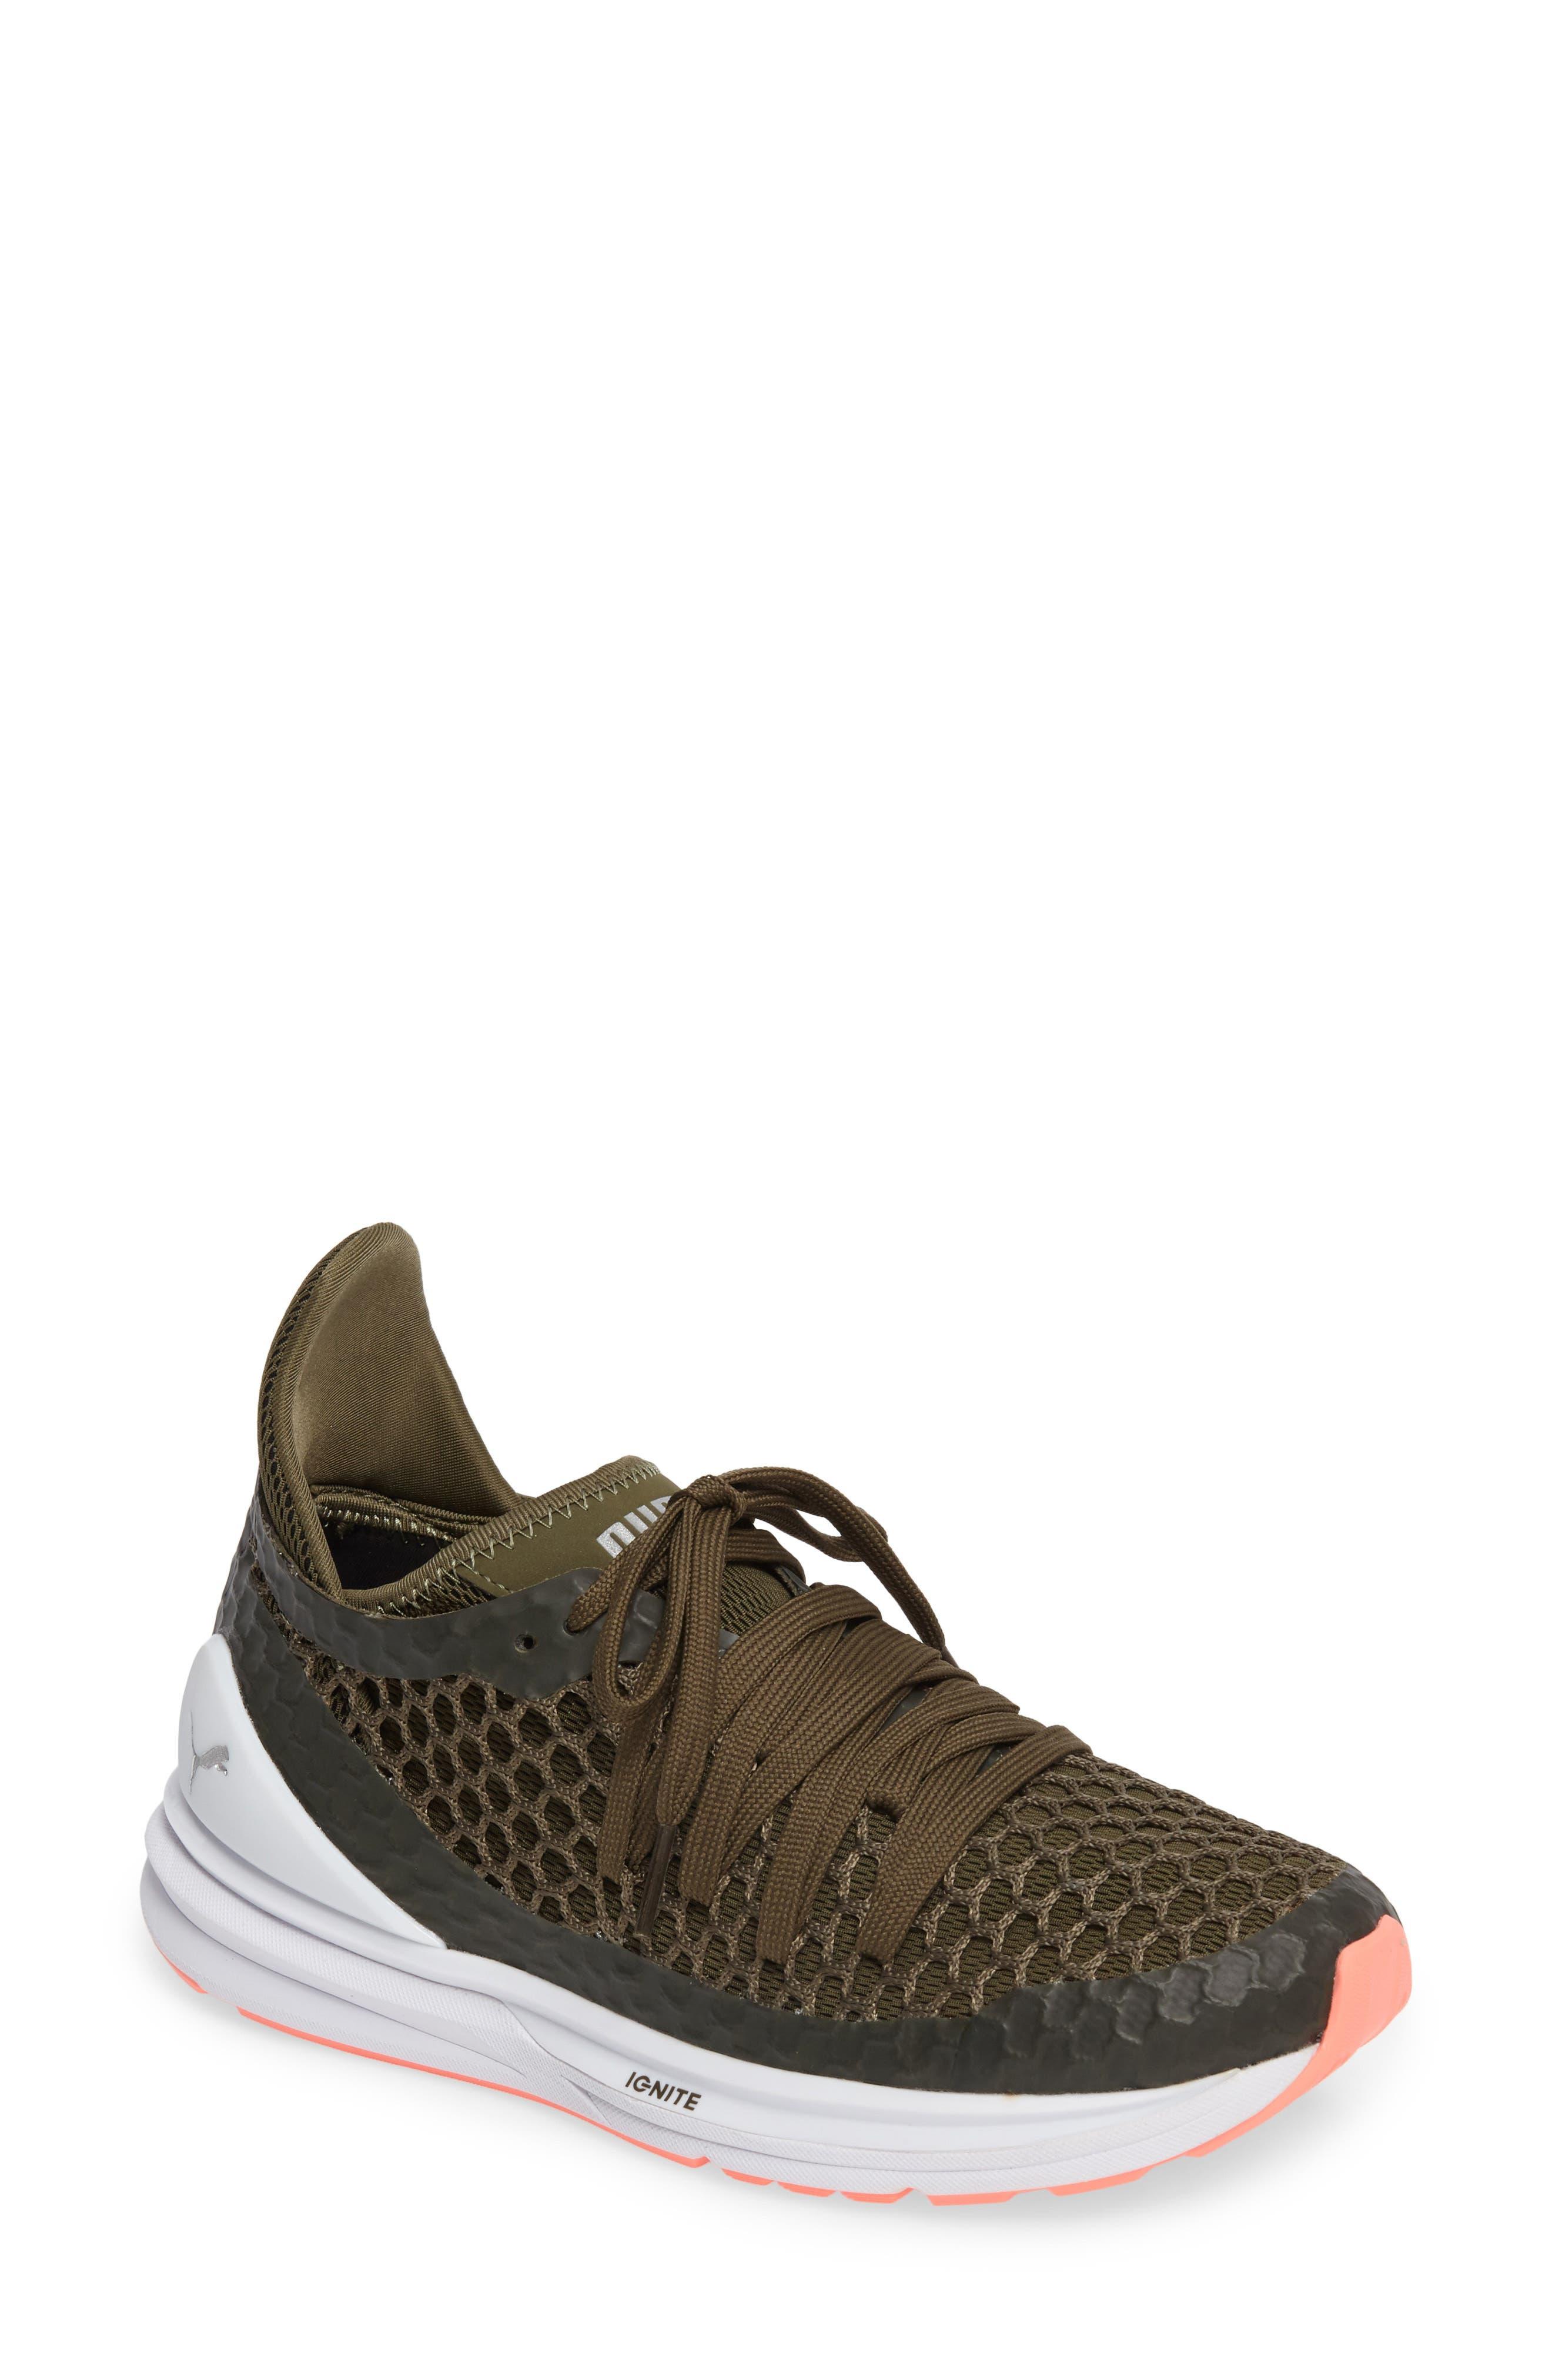 PUMA Ignite Limitless Netfit Running Shoe (Women)